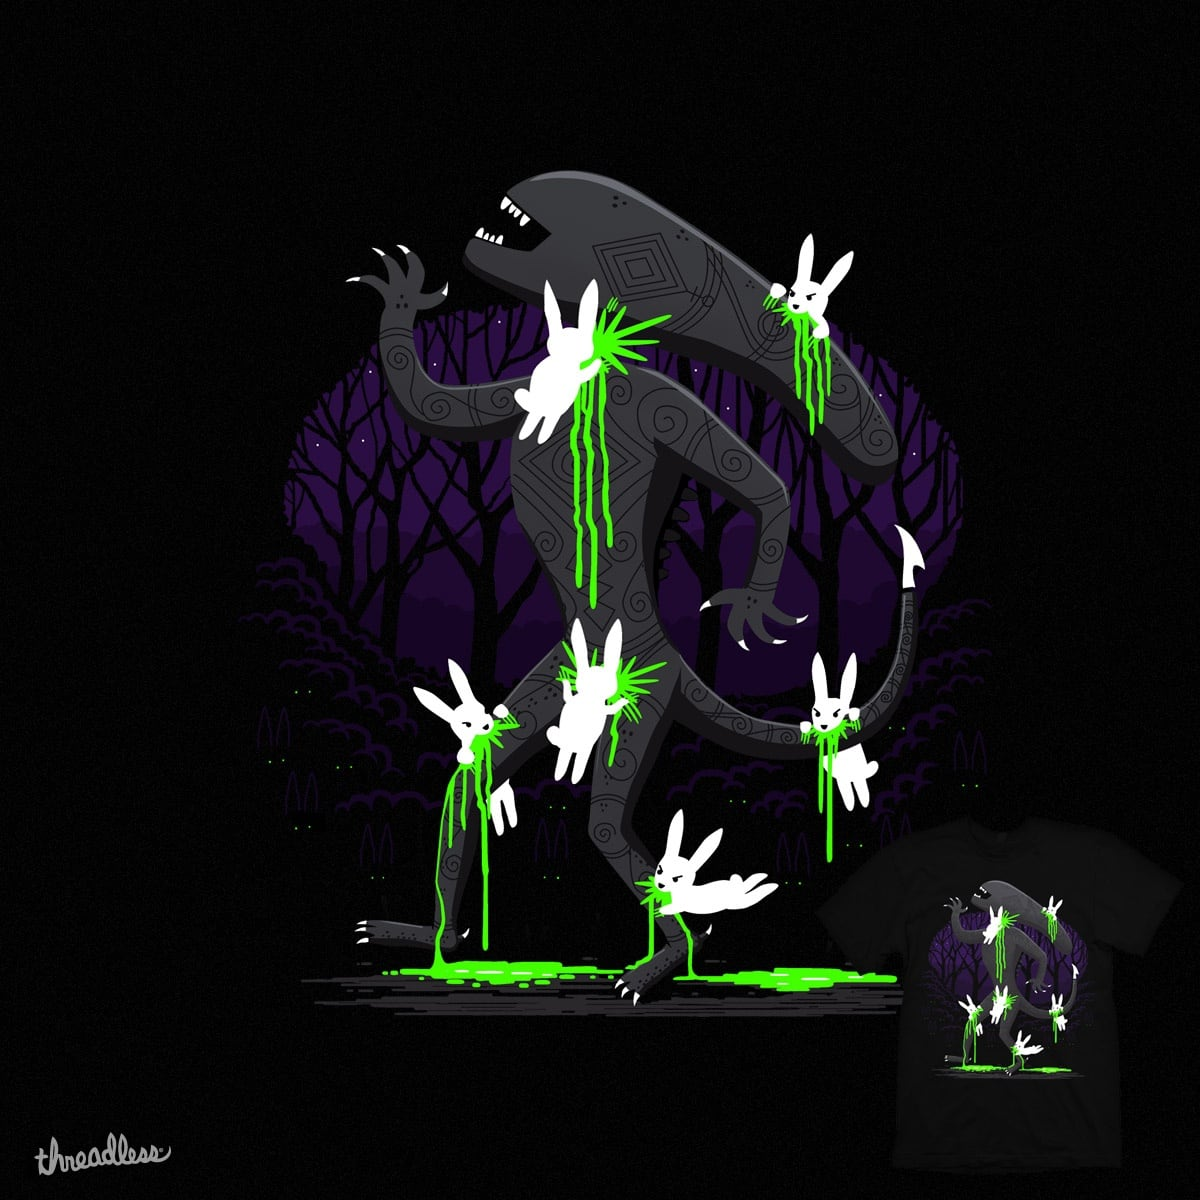 Alien Vs Predators by kuli_grafis on Threadless